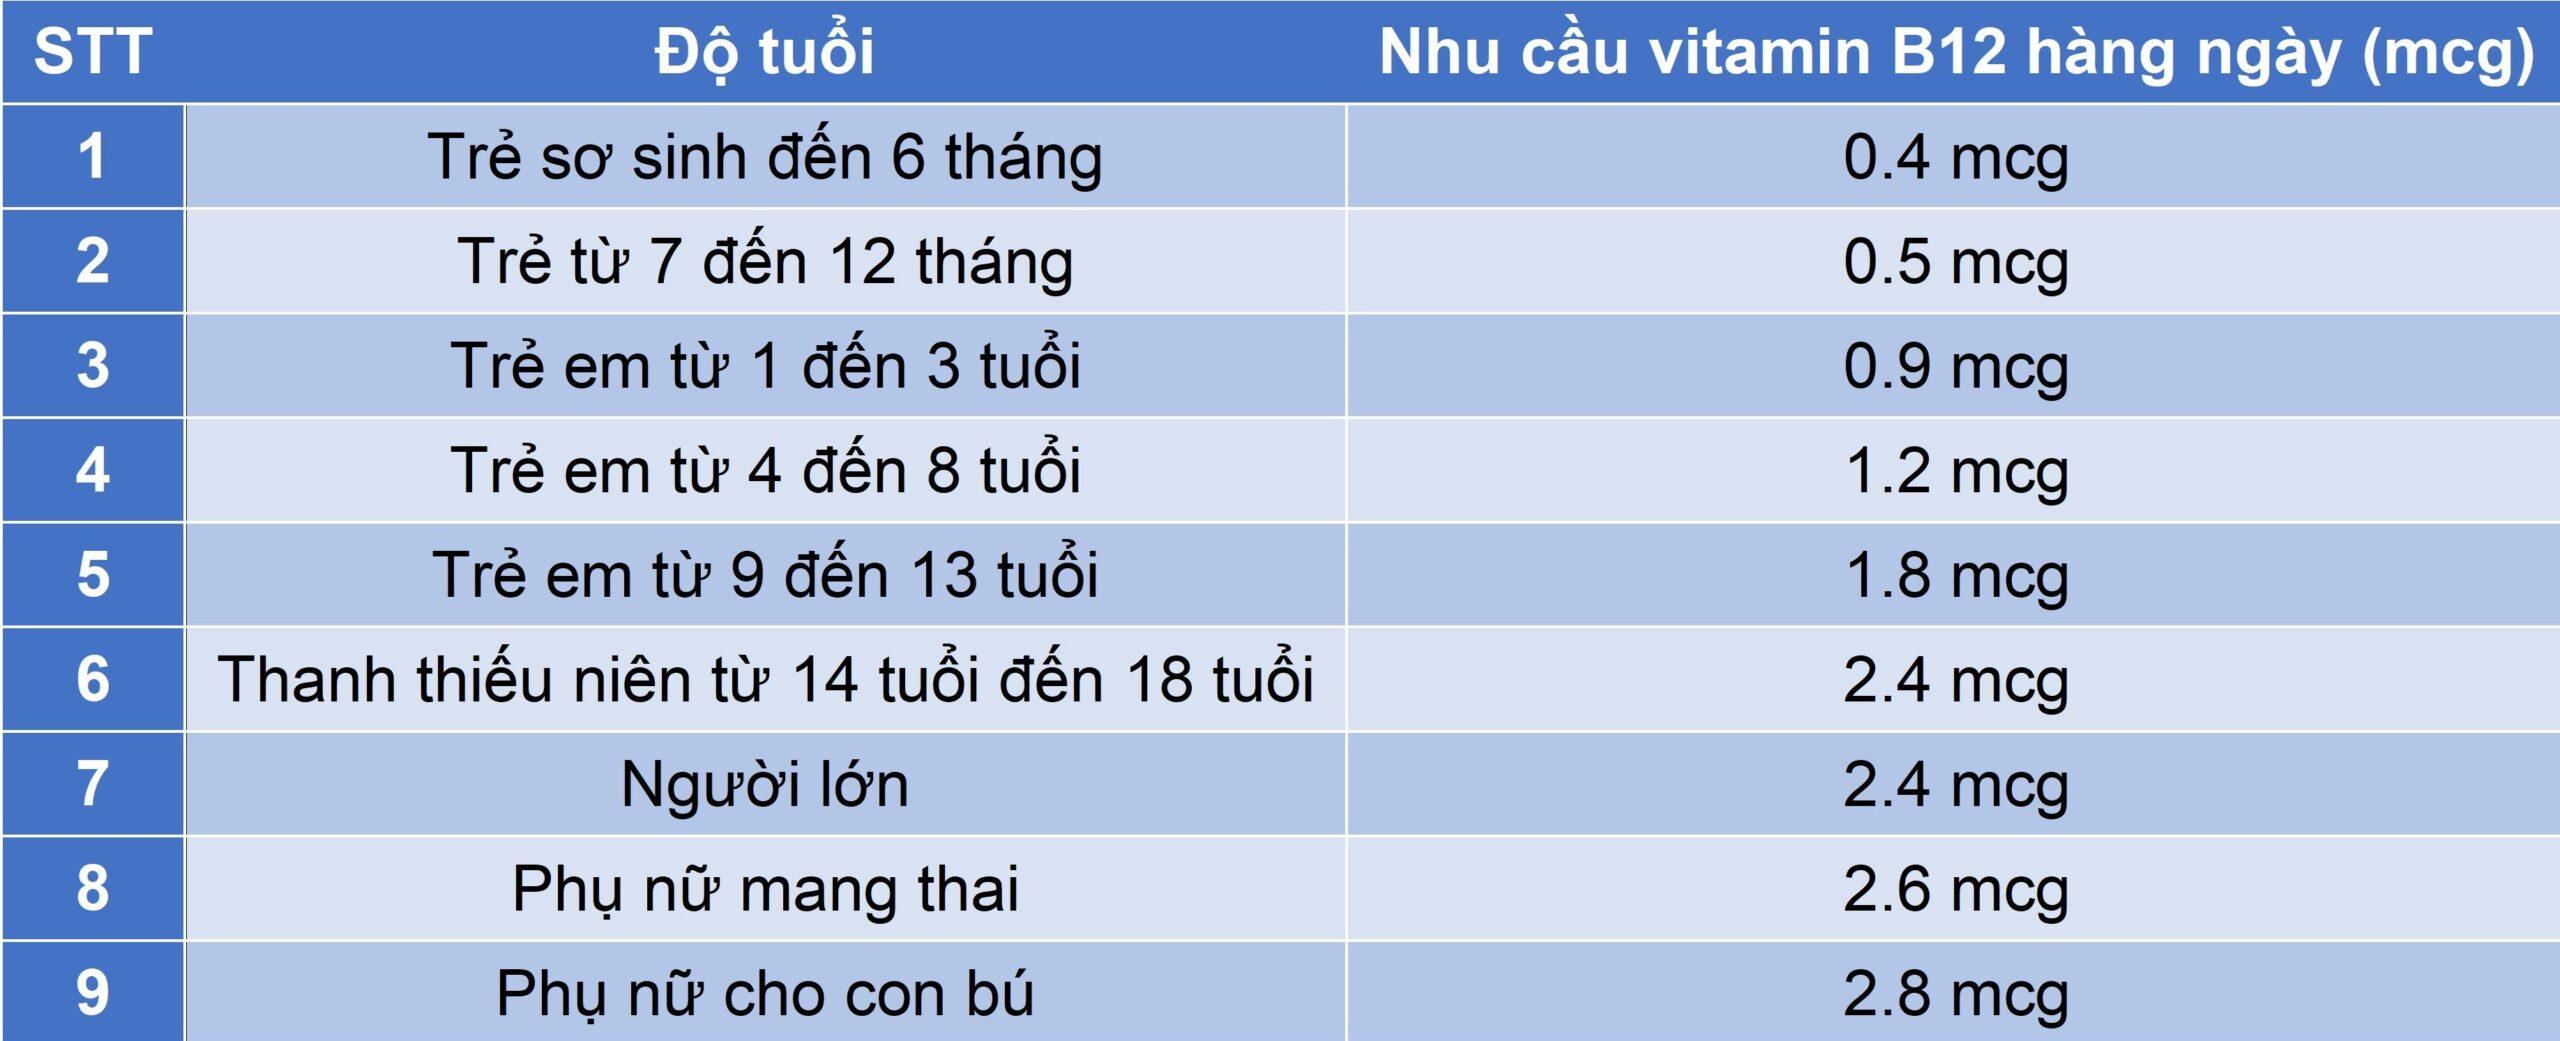 nhu-cau-vitamin-B12-theo-tung-do-tuoi